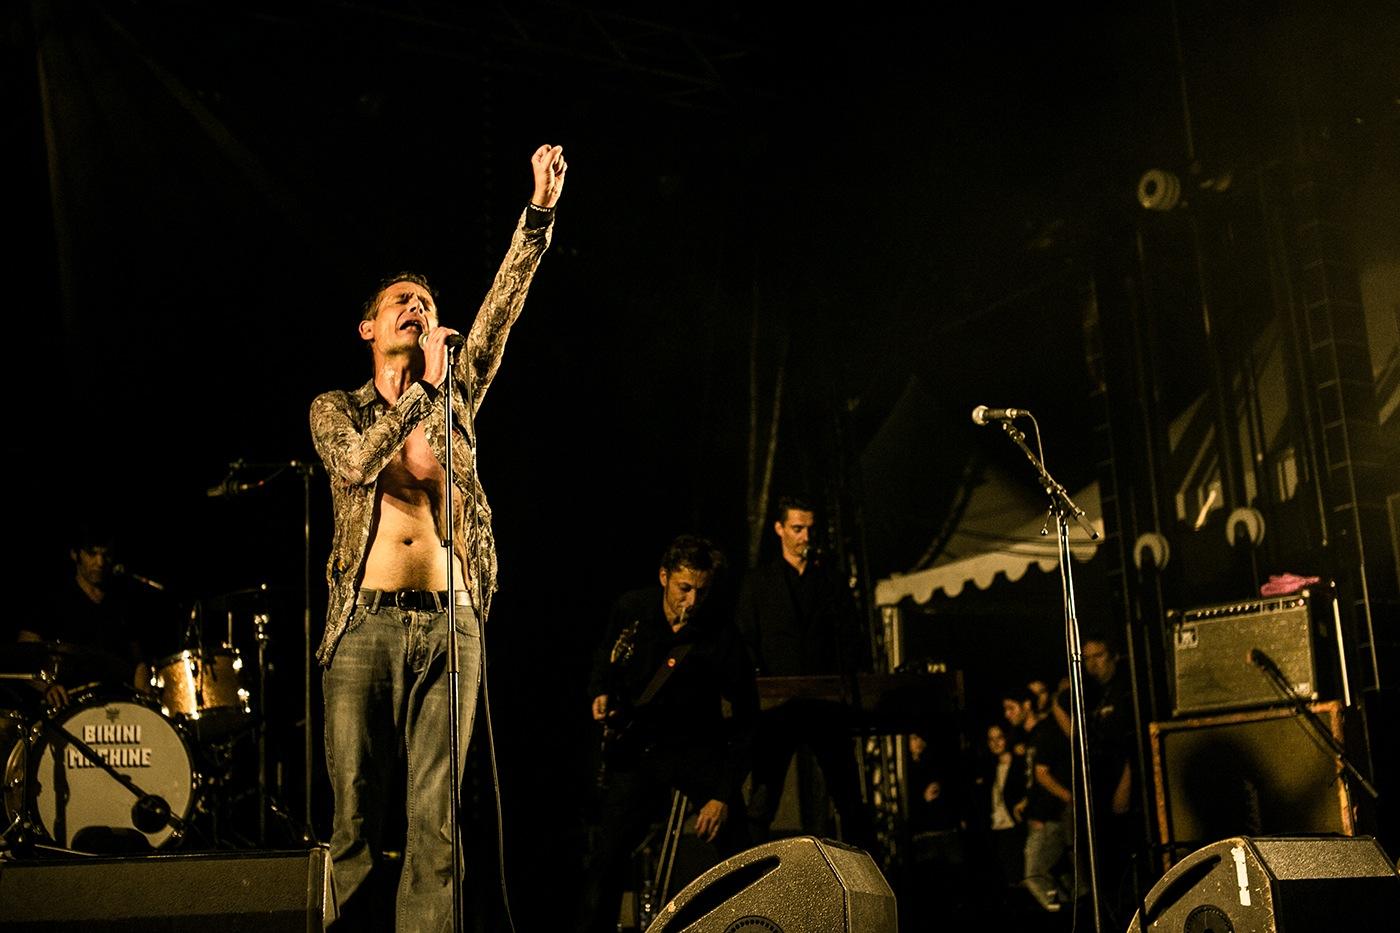 photographe-reportage-festival-rockadel-guillaume-heraud-051-small